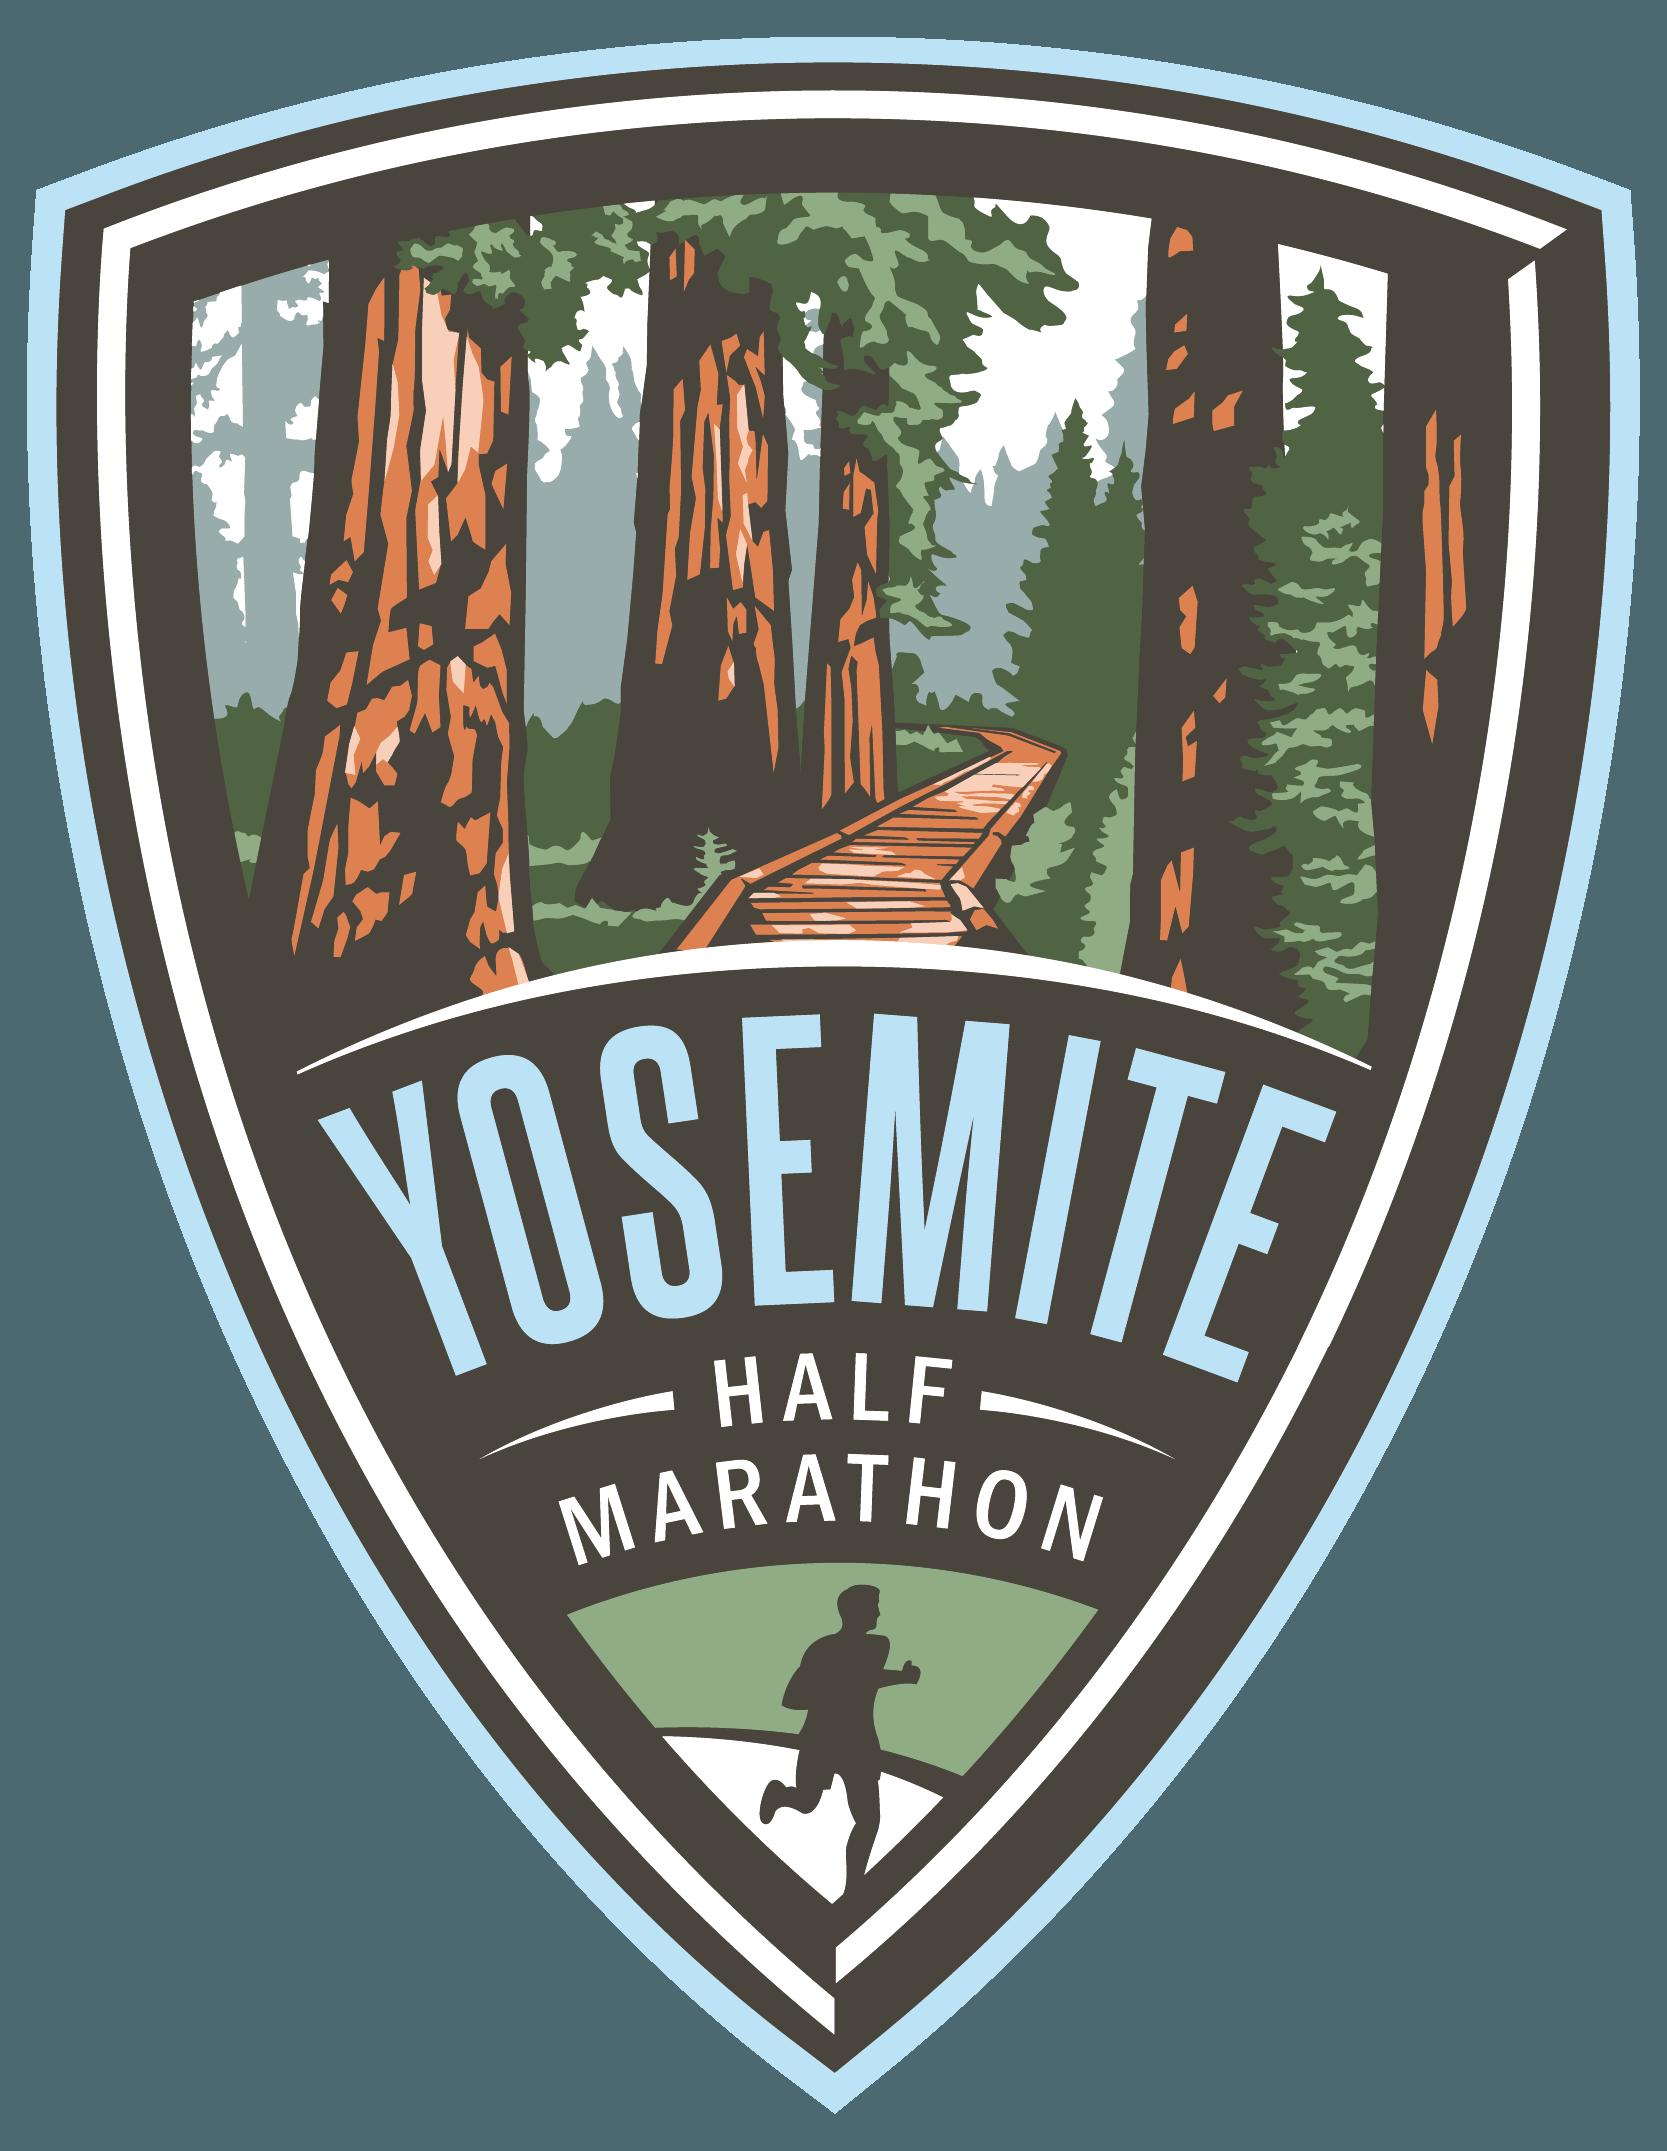 Yosemite Half Marathon logo